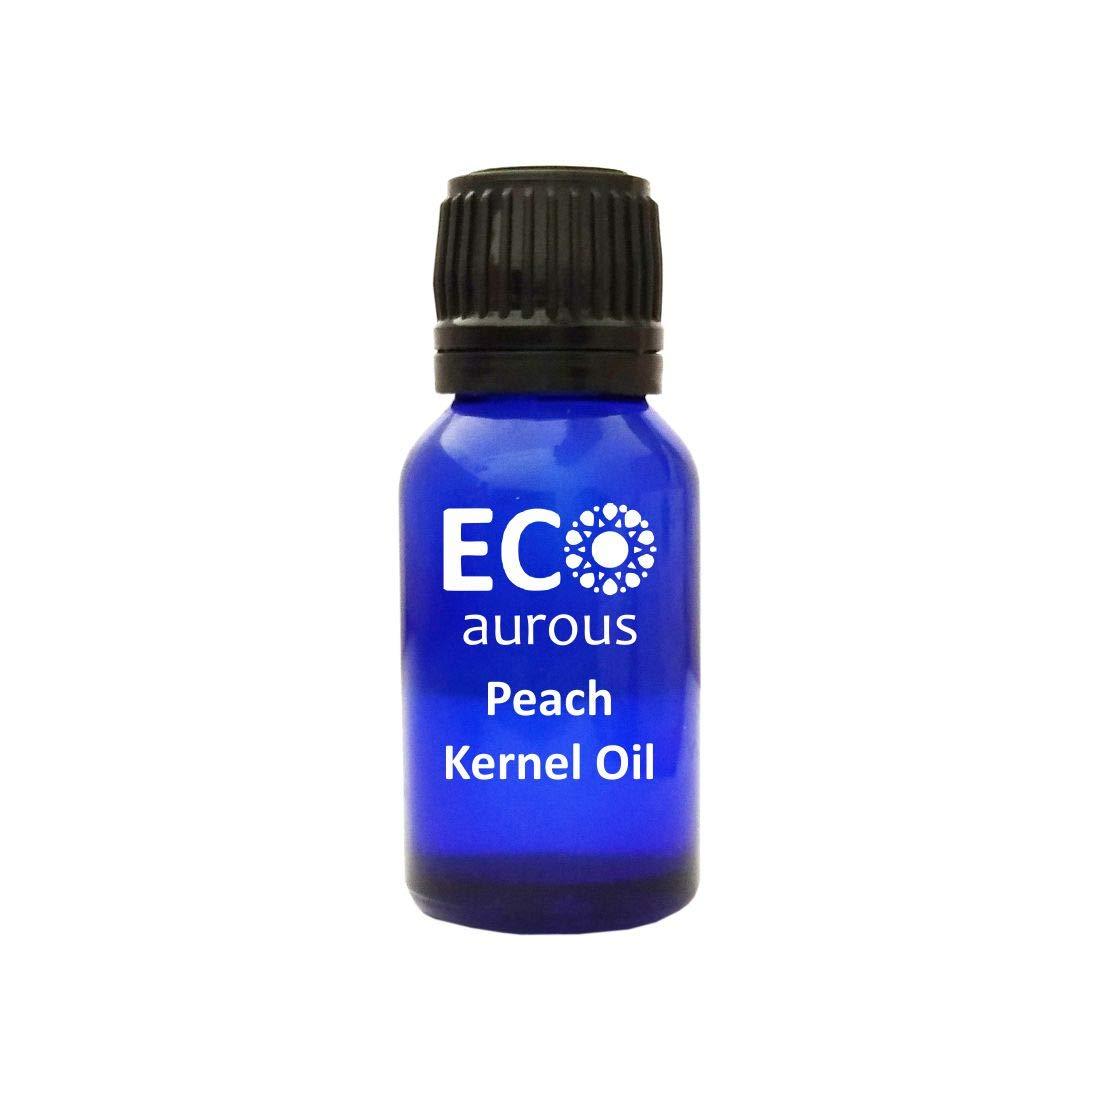 Persica Natural Organic Eco Aurous